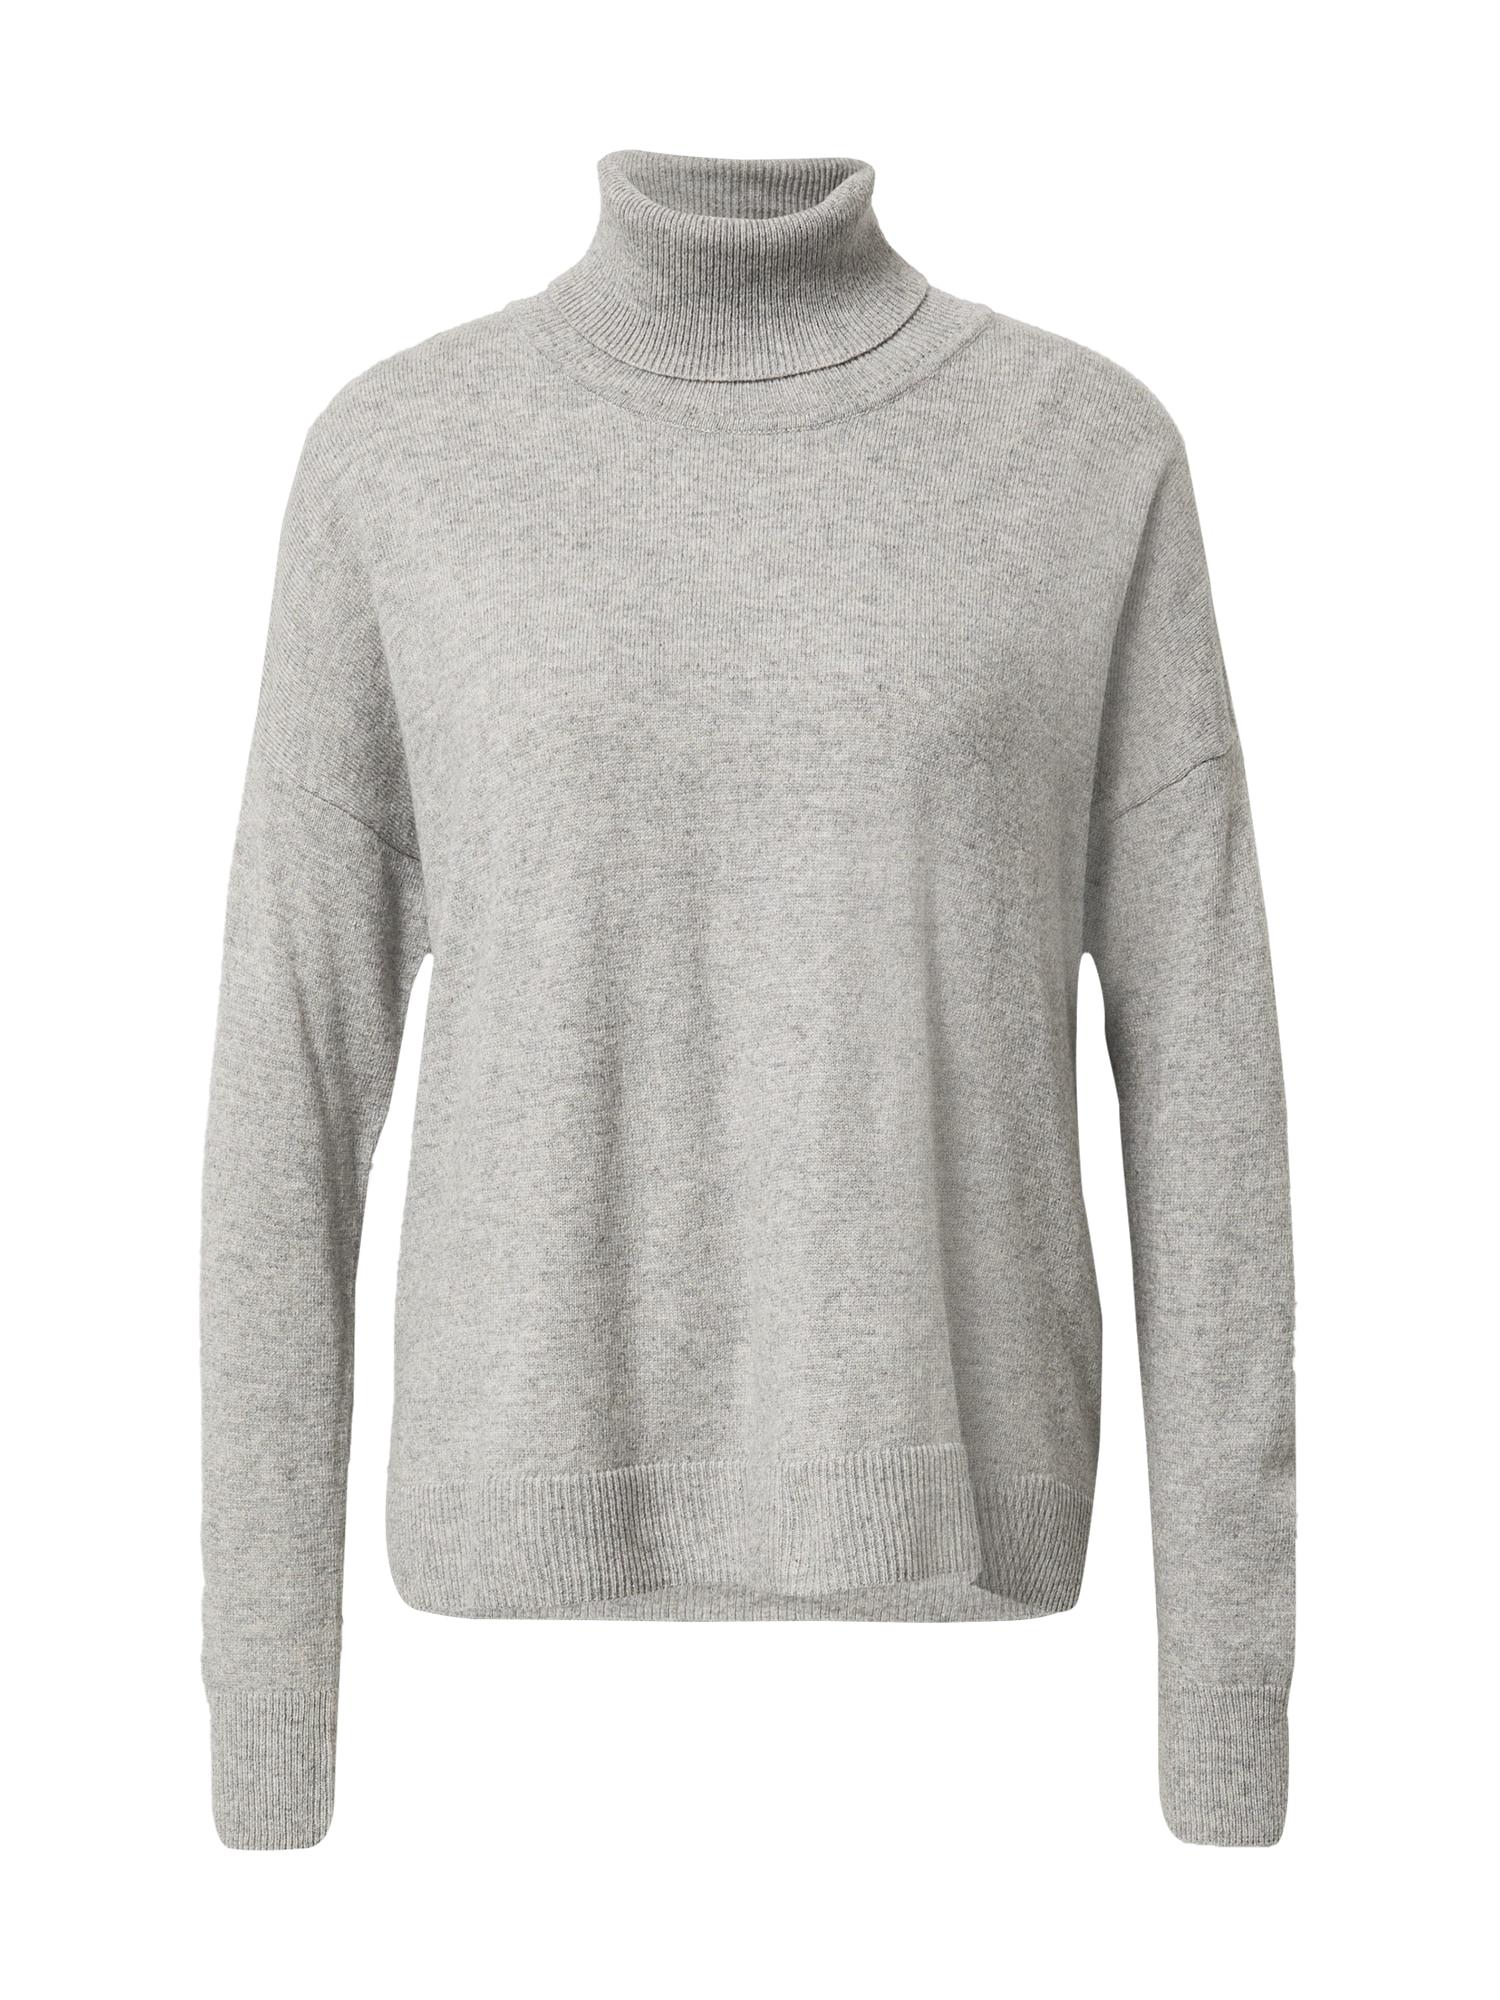 InWear Megztinis margai pilka